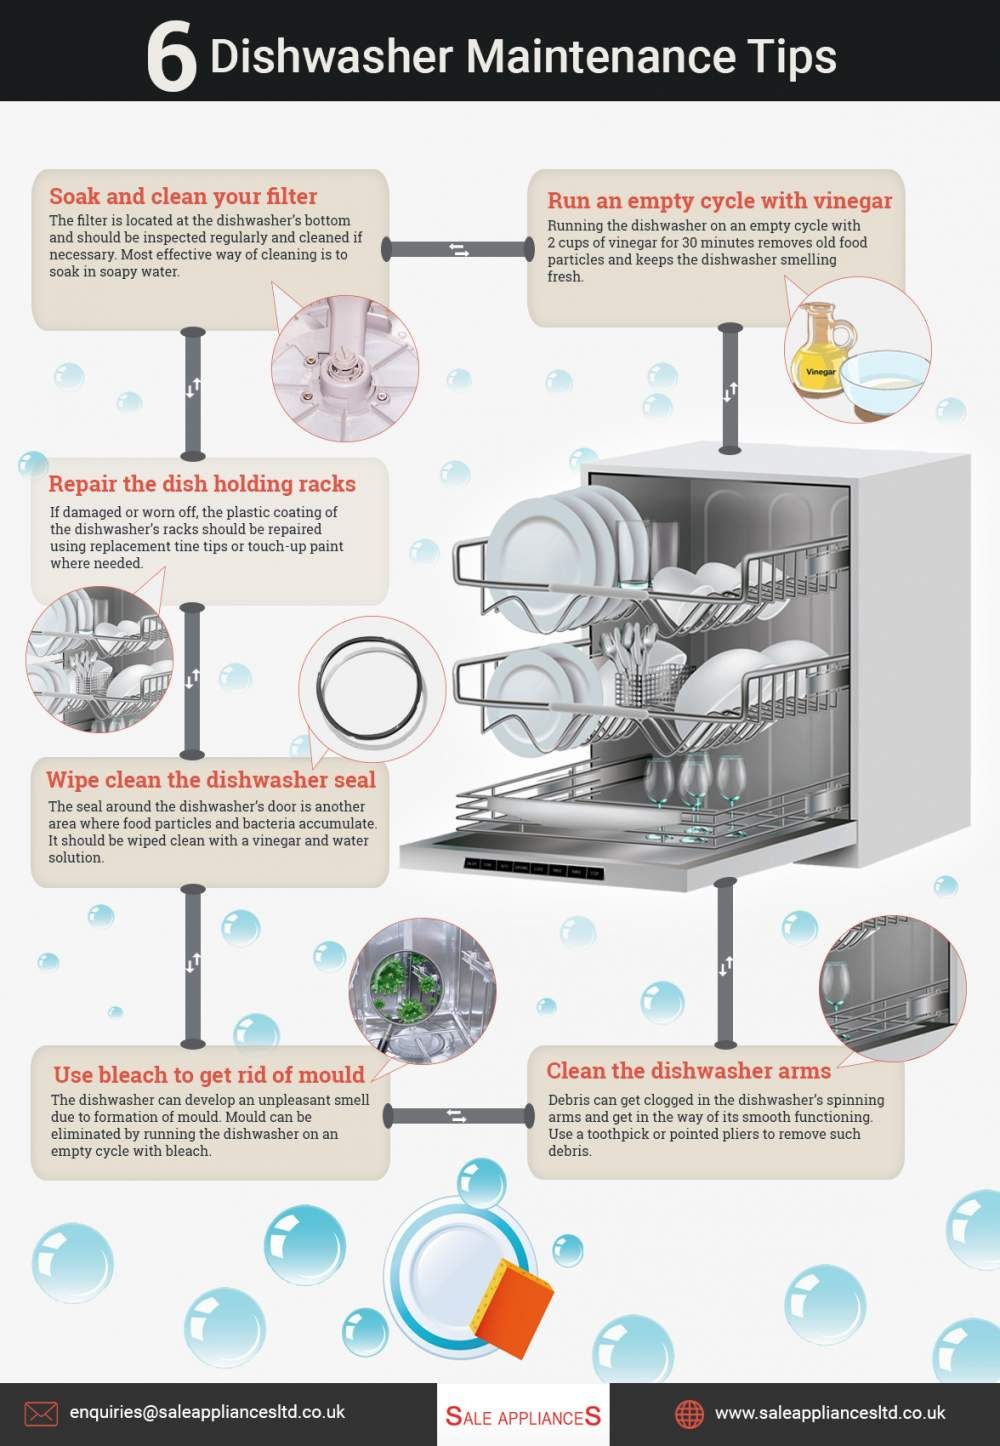 Simple Dishwasher Maintenance Tips Infographic Portal Dishwasher Repair Dishwasher Smell Best Dishwasher